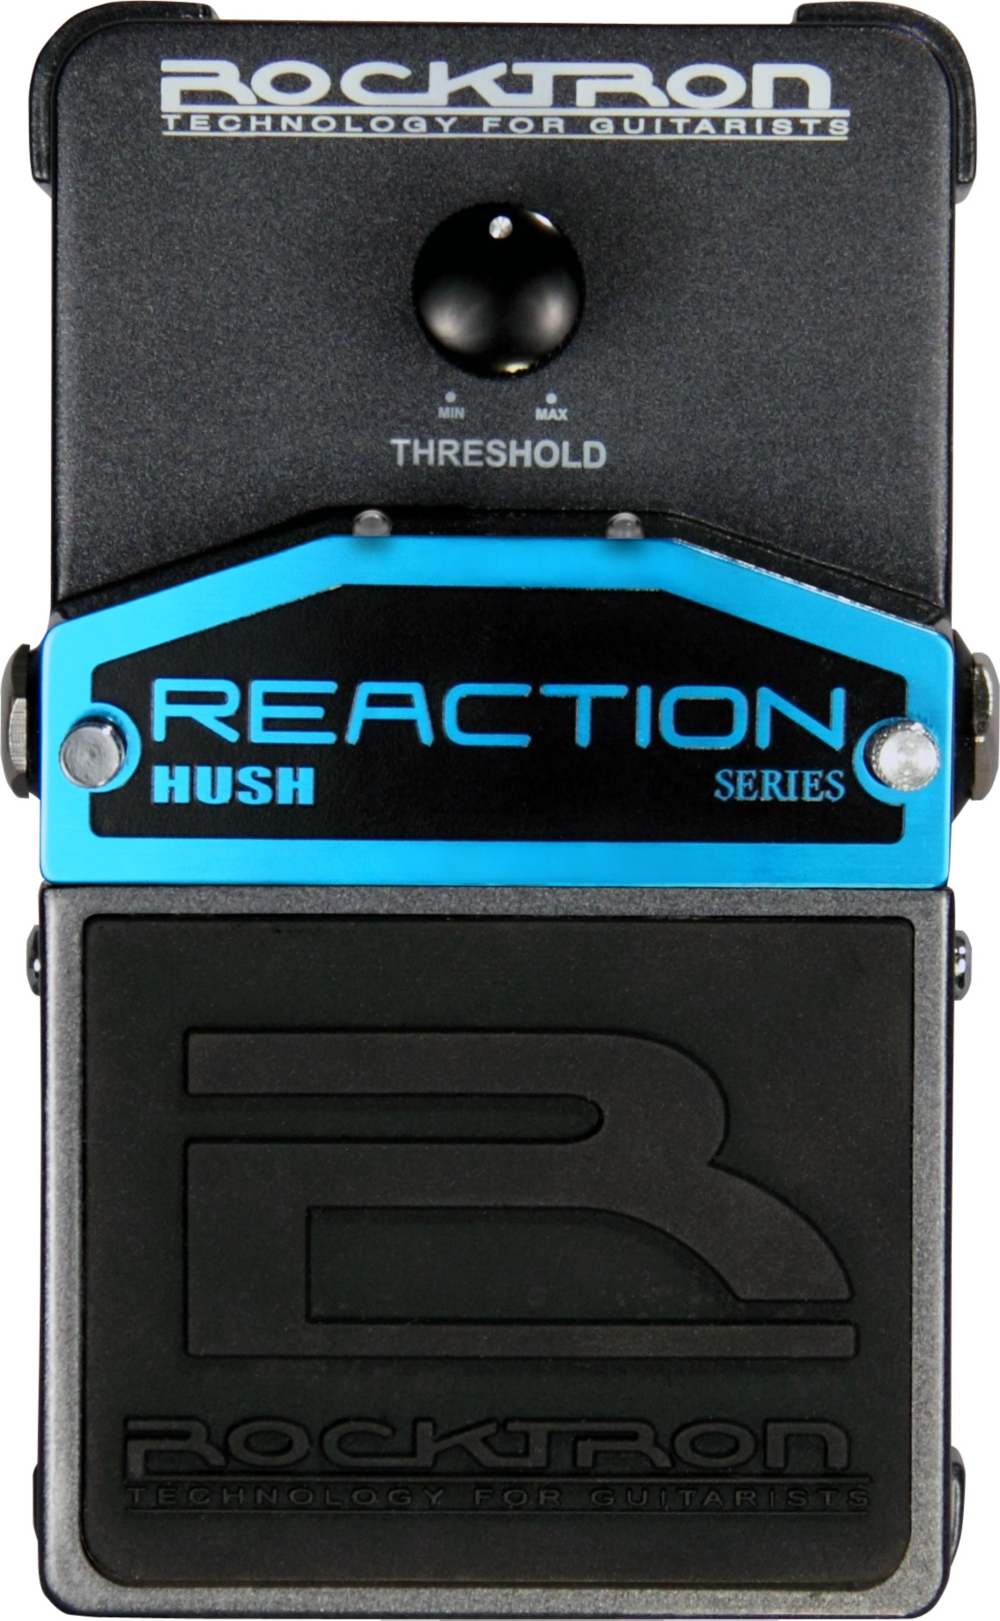 Rocktron Reaction HUSH Noise Reduction Guitar Effects Pedal by Rocktron